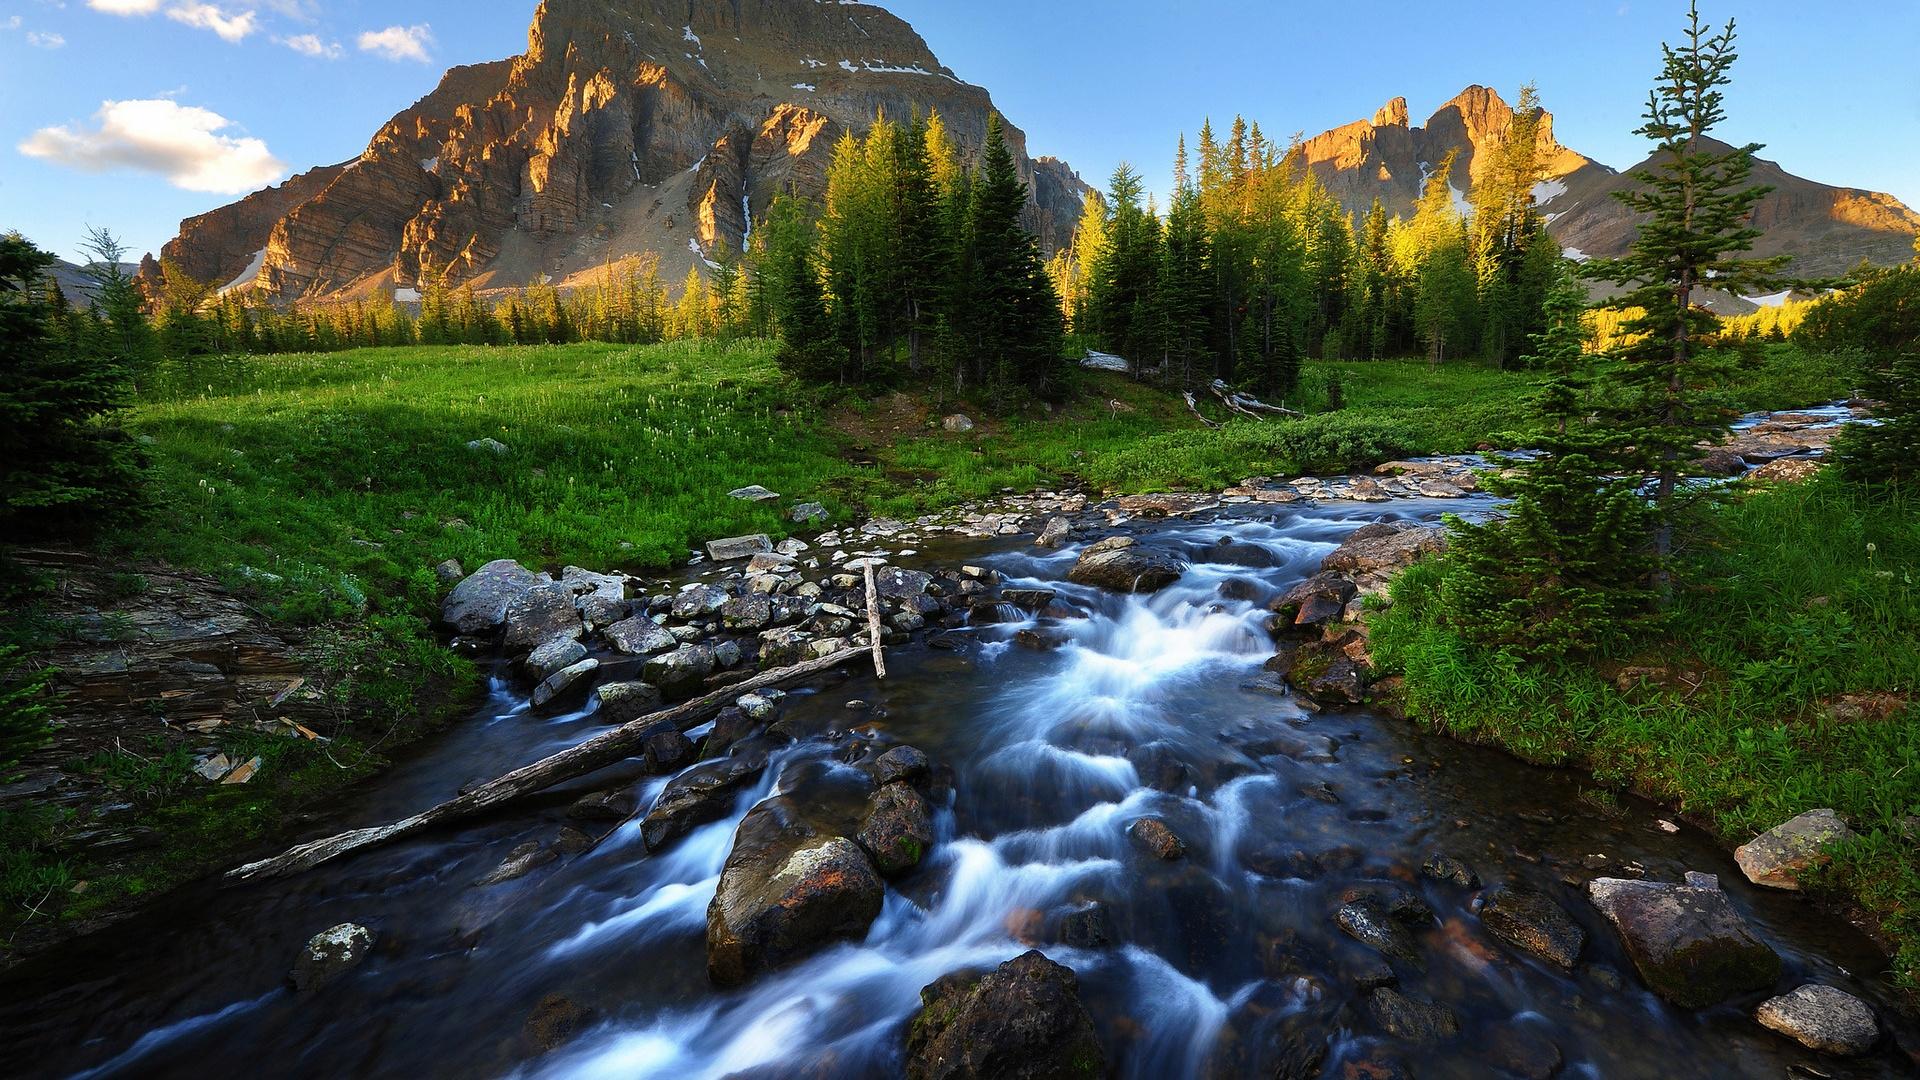 Sweet Waters A River A Plague and a Savior Ocieanna Fleiss 1920x1080